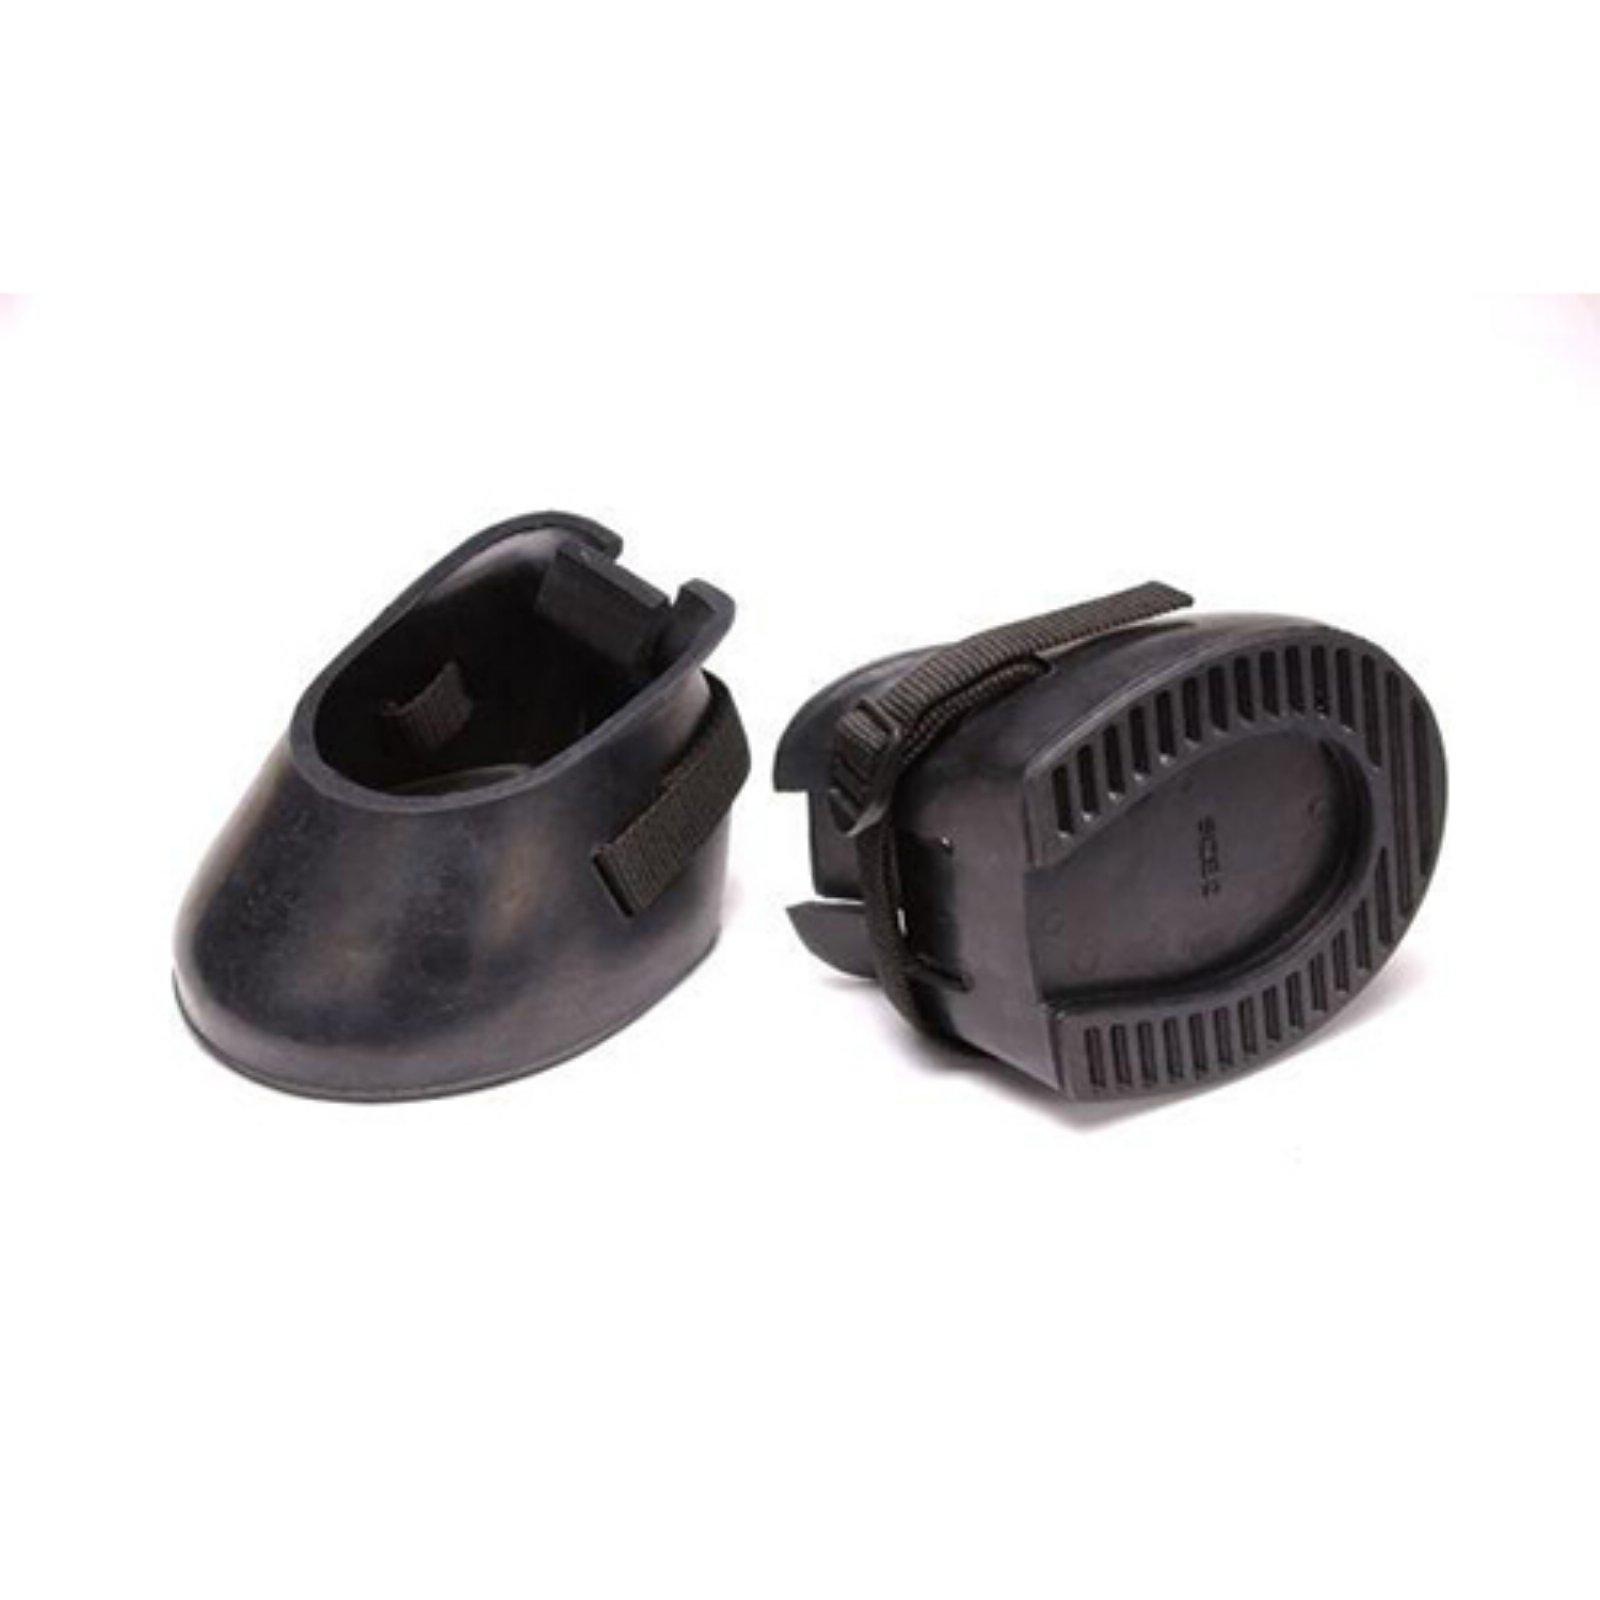 Tough-1 Black Hoof Guard Boot